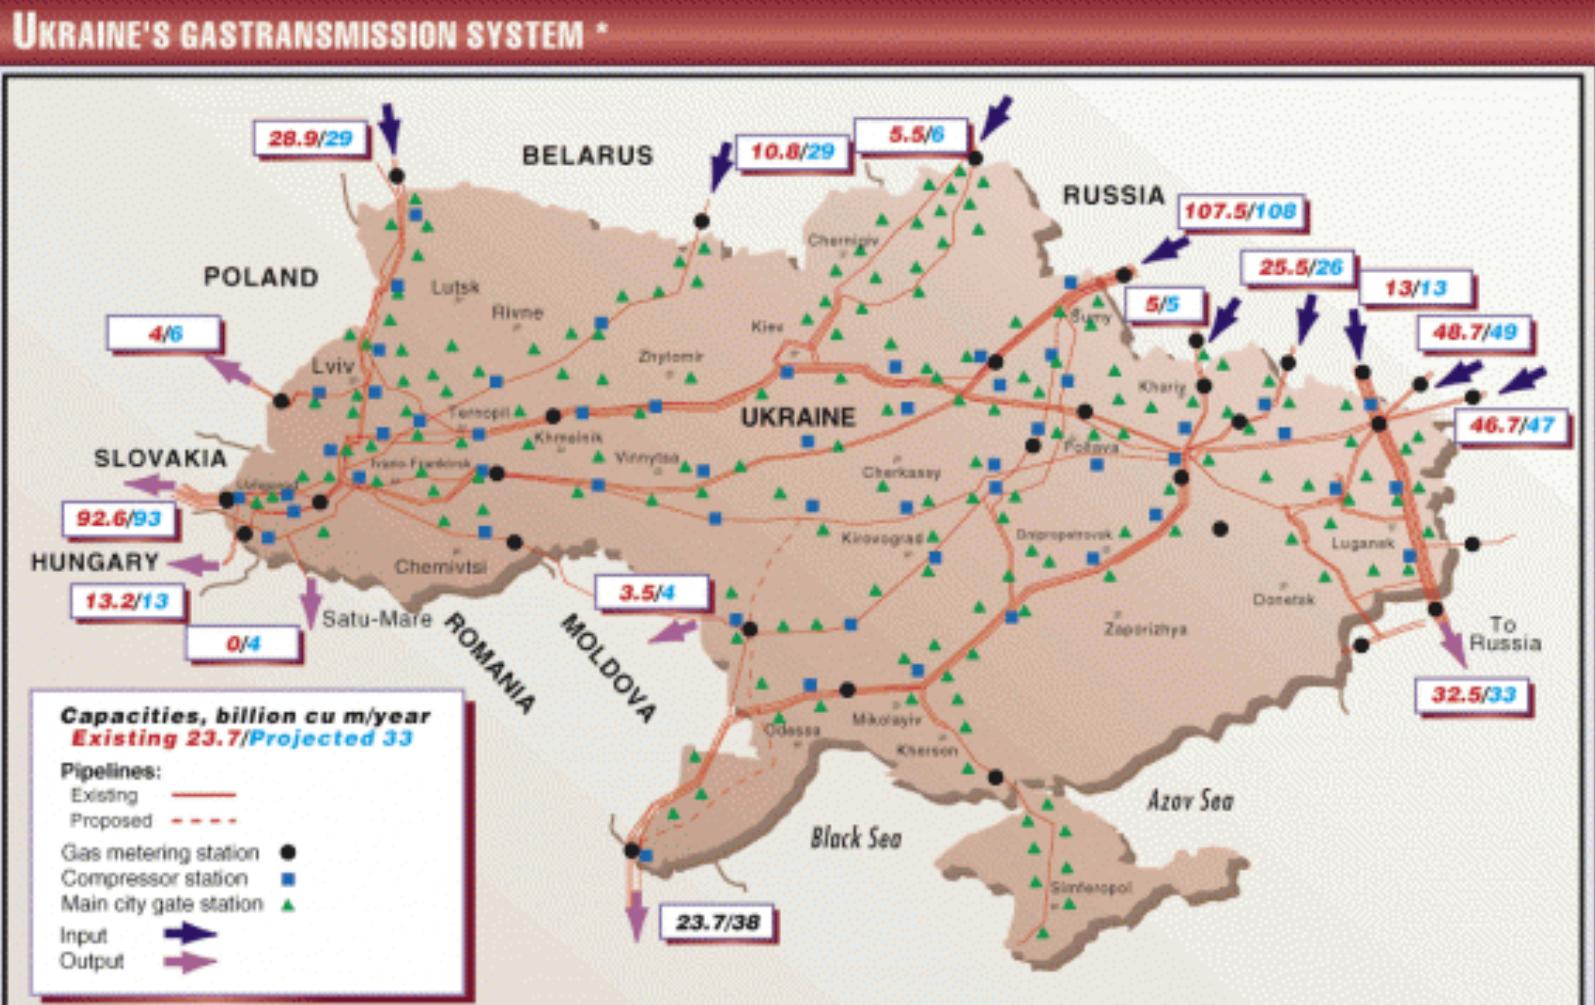 Ukraine's gas transmission system